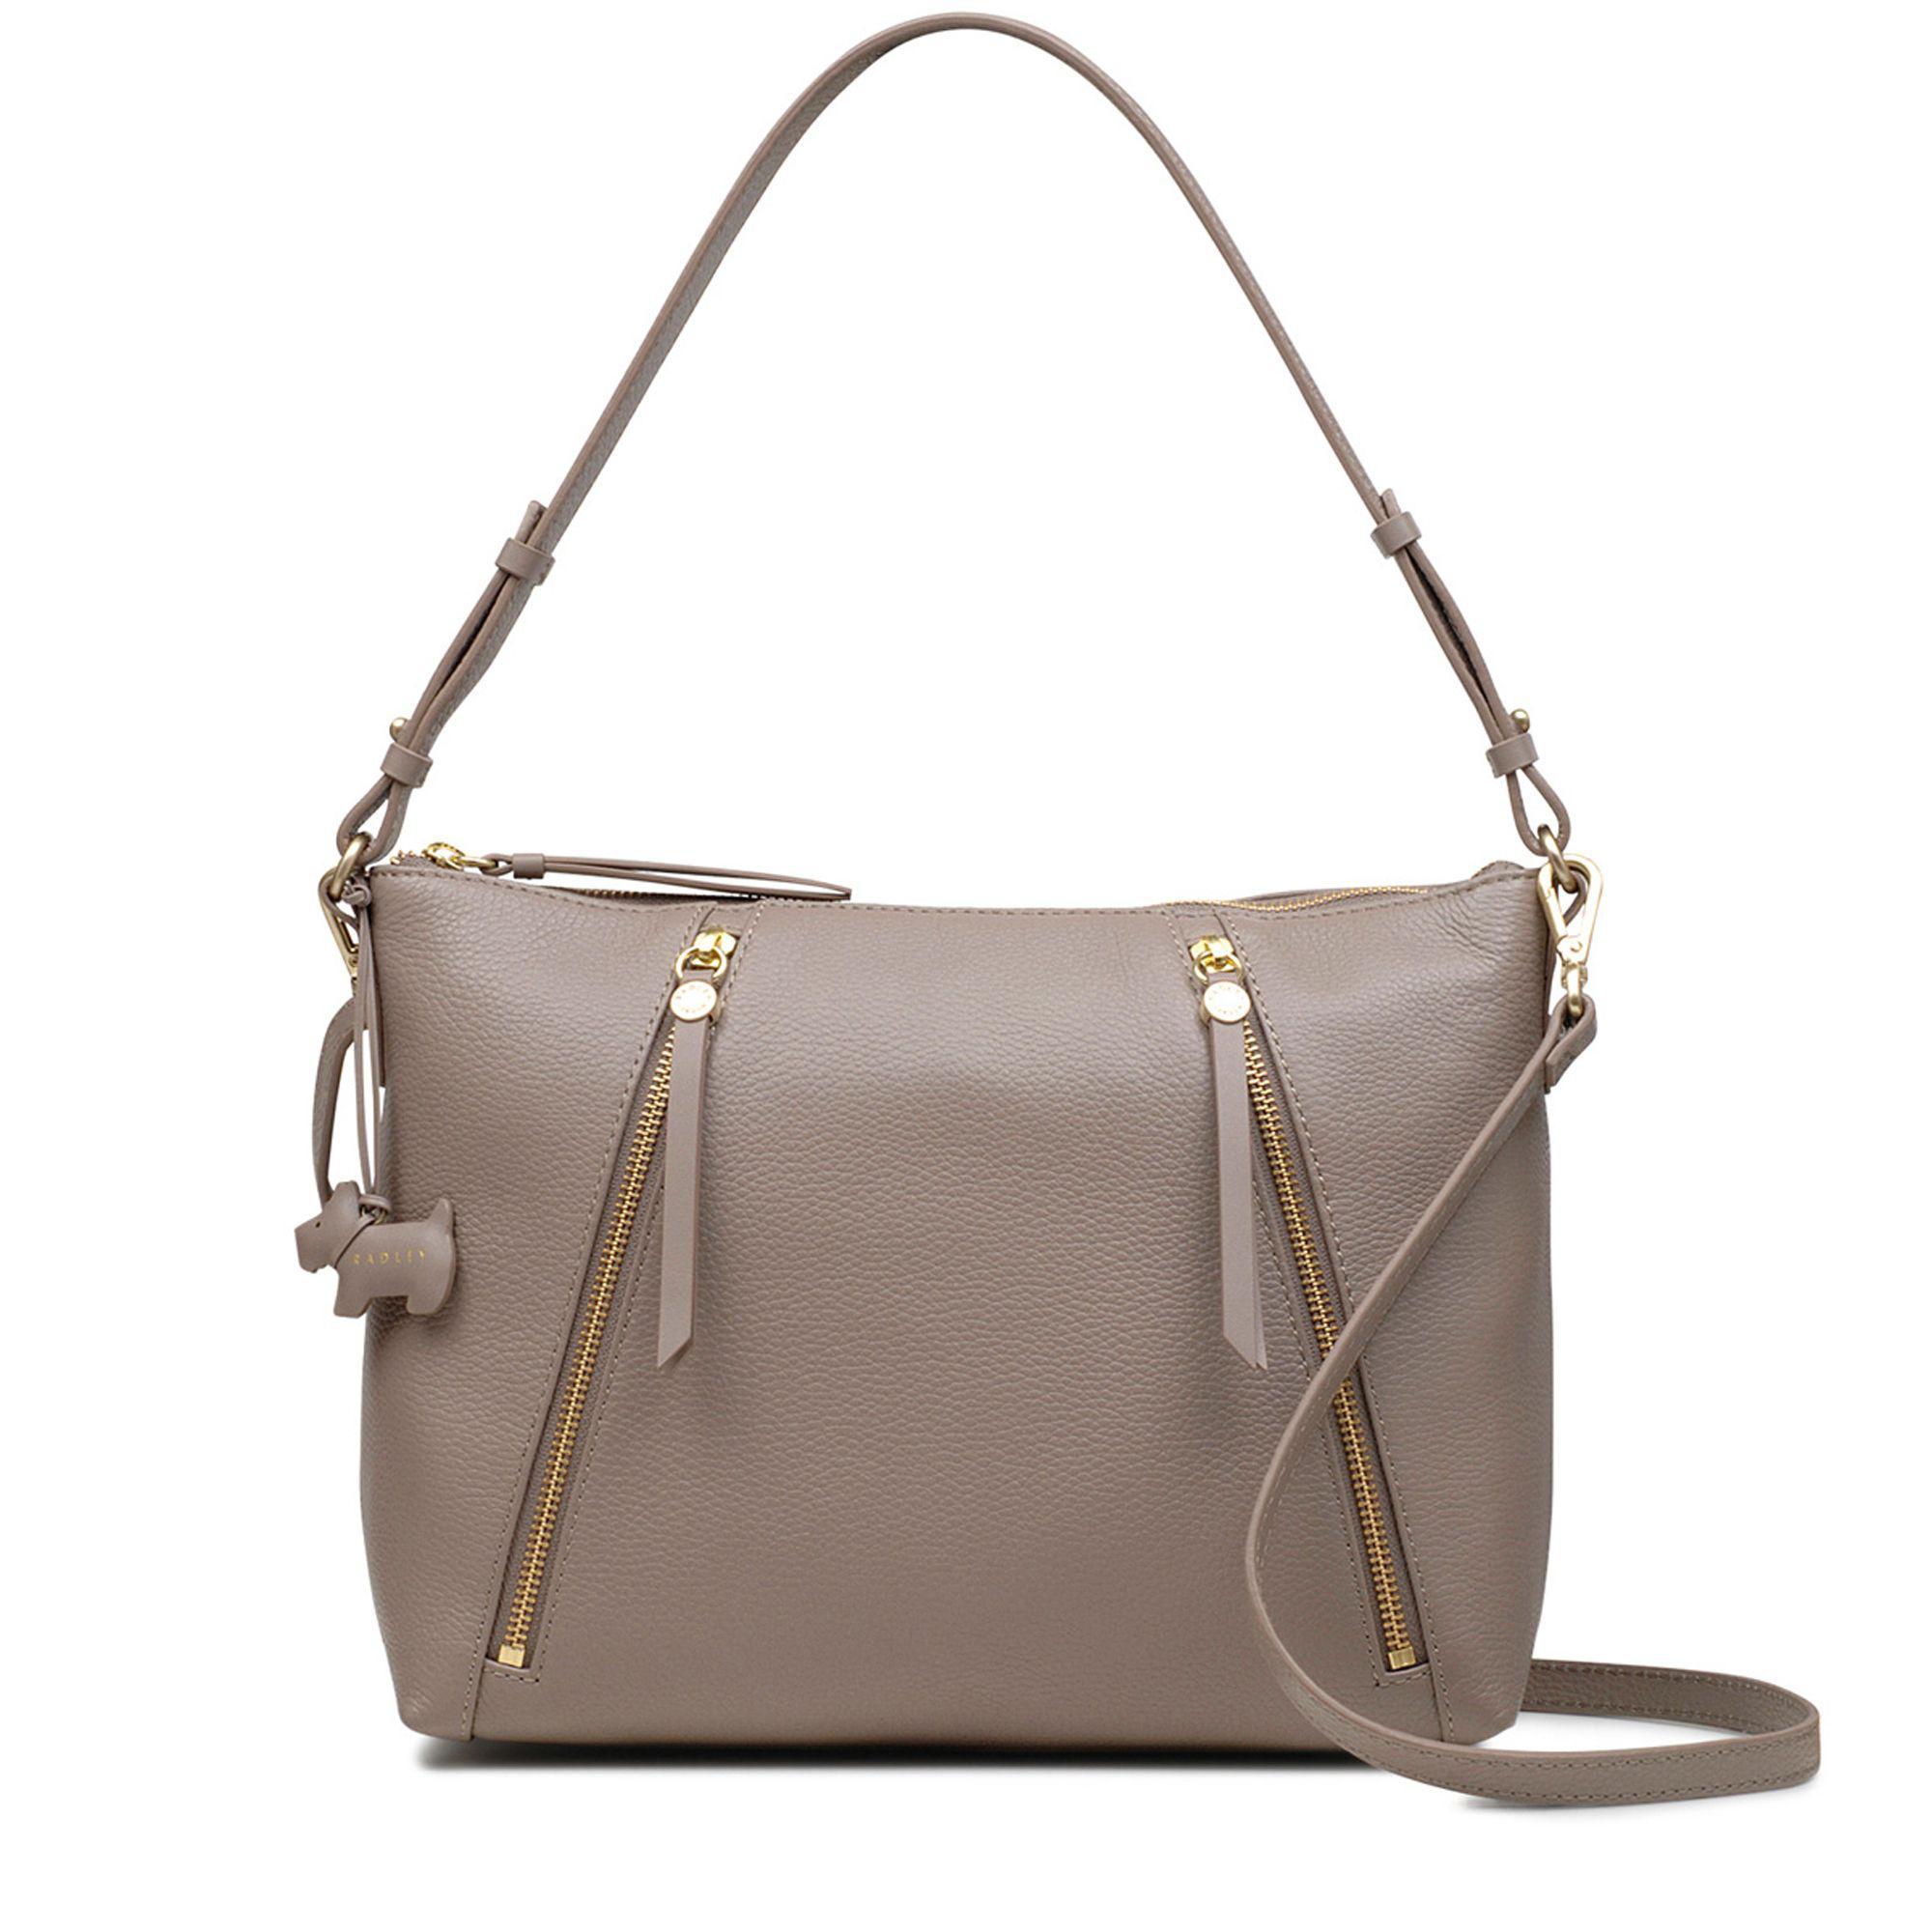 3d24dd4e0846 Radley Taupe Leather  fountain Road  Medium Multiway Shoulder Bag - Lyst